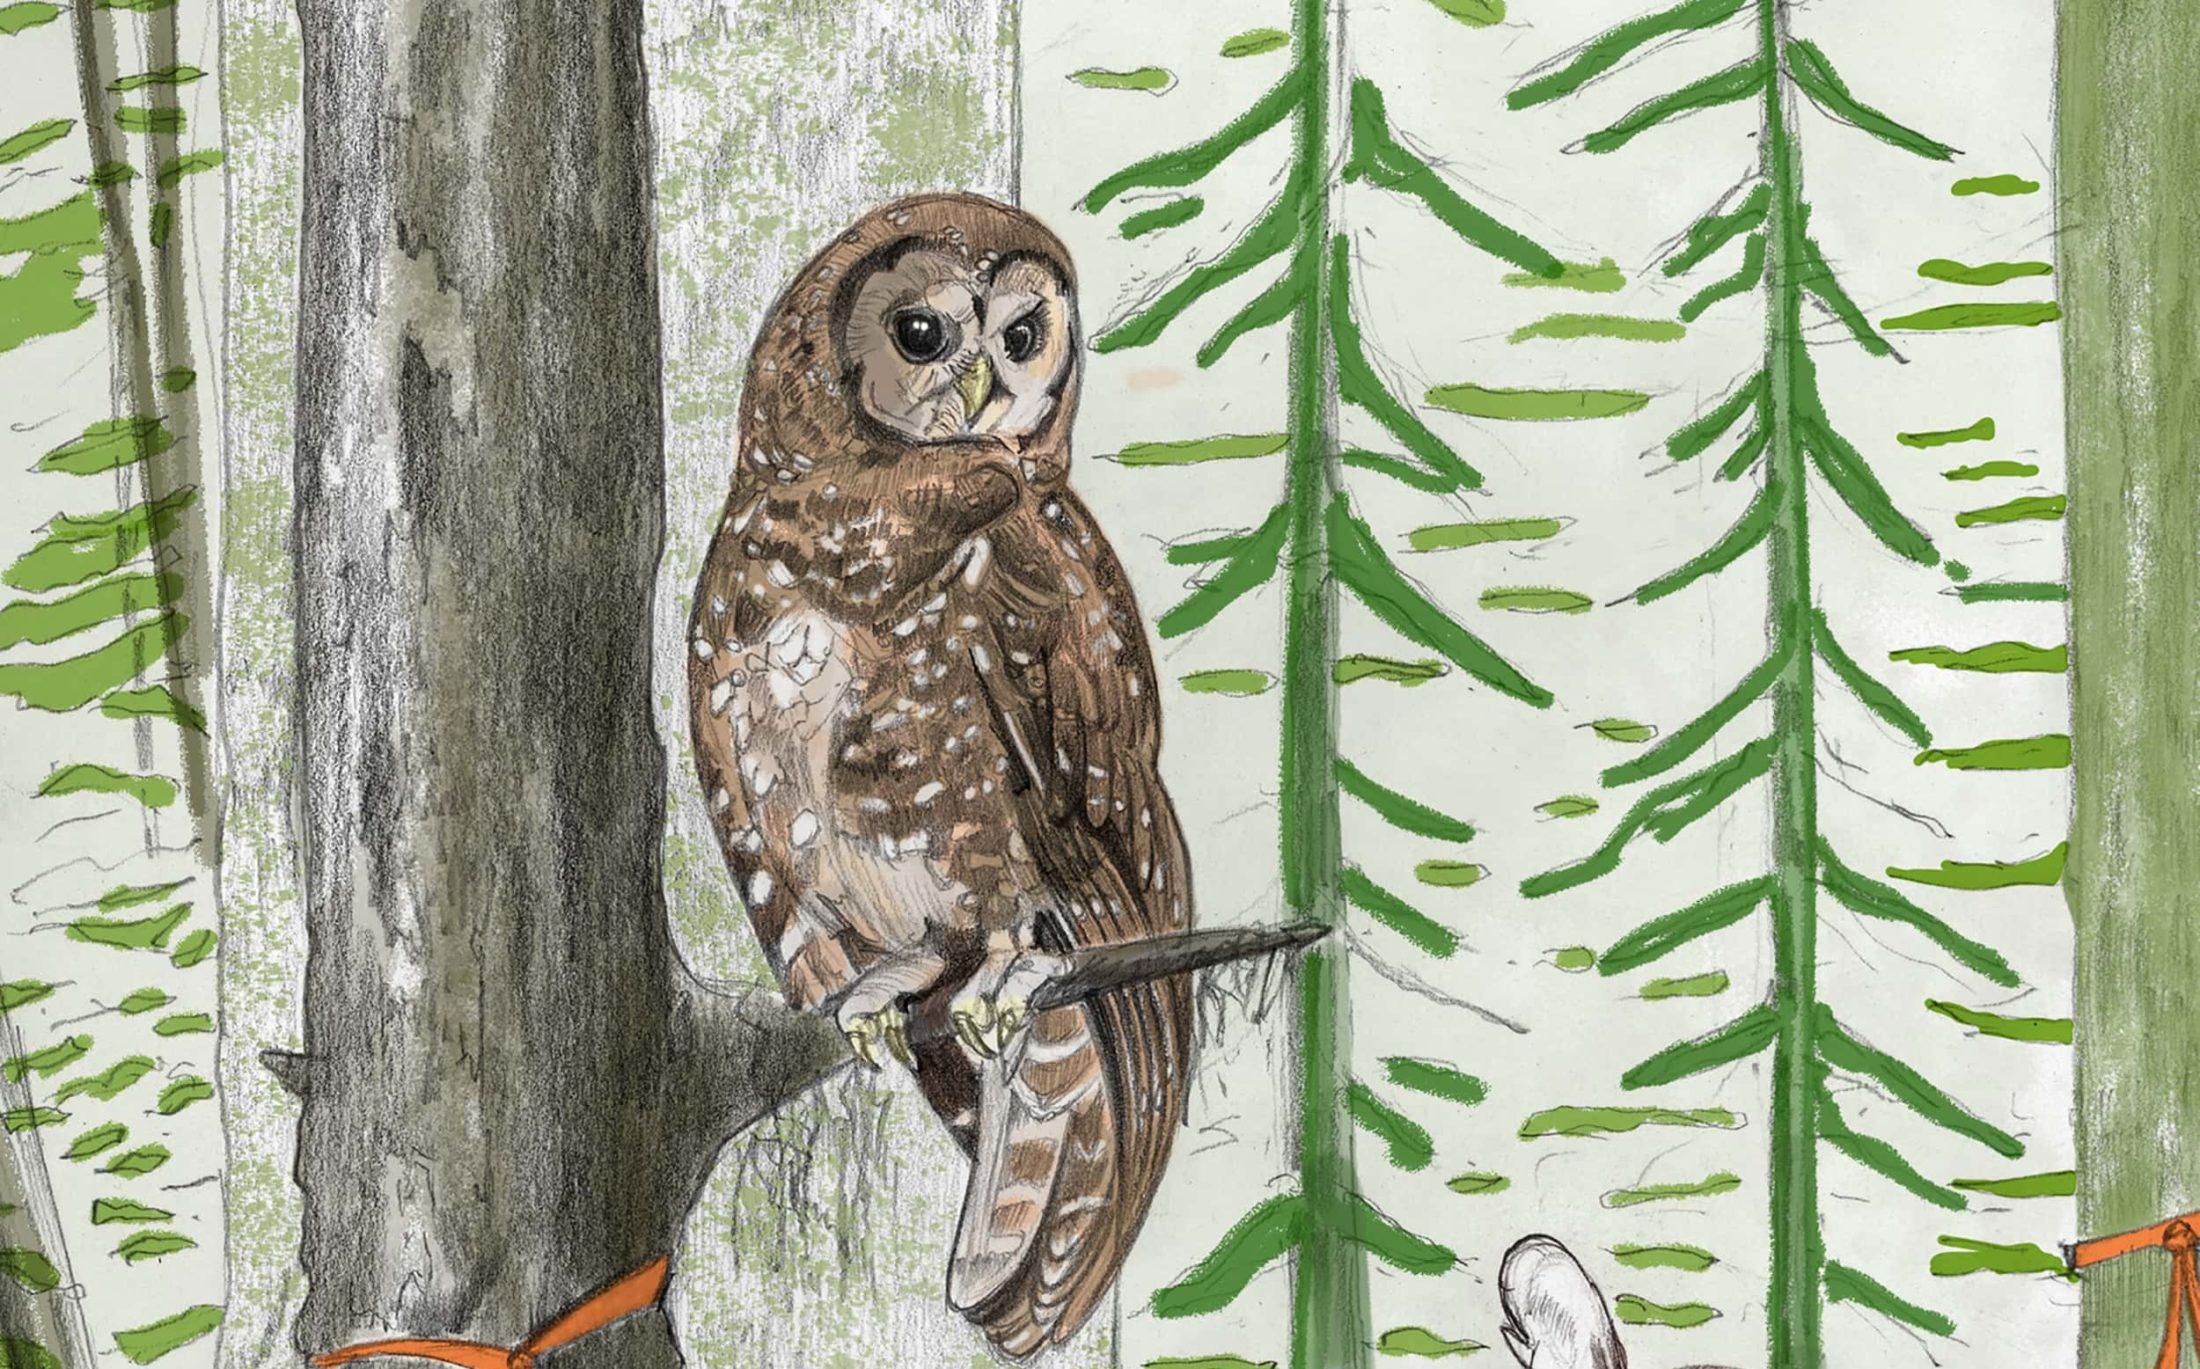 Spotted owl illustration